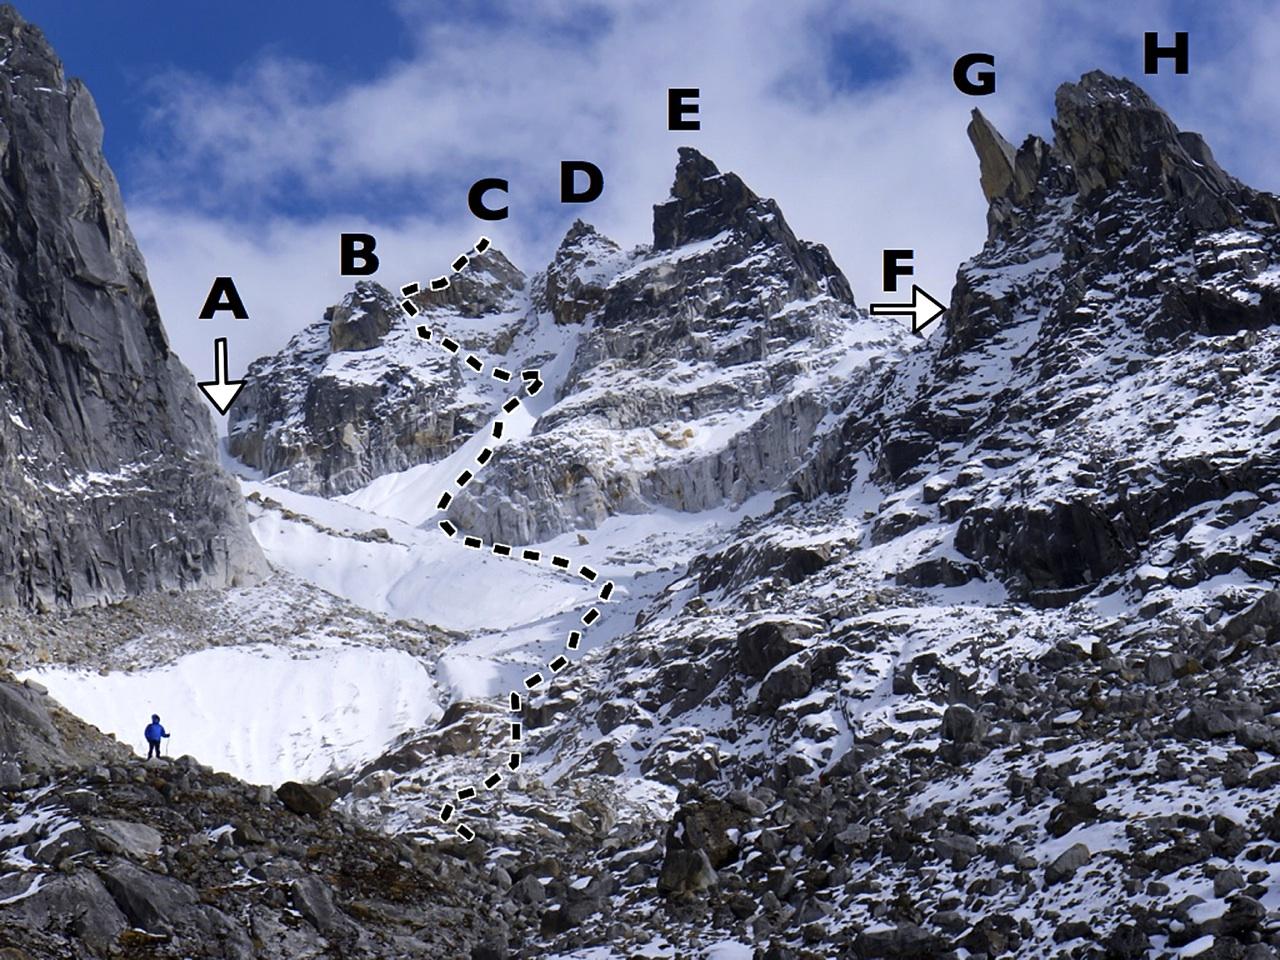 Bahini Group from the east. (A) Lama Lamani-Prabhu Behin Col. (B) Unnamed. (C) Prabha Behin. (D) Unnamed. (E) Kali Behin. (F) Soneri Behin. (G) Churi. (H) Kanchi Behin. Roger Payne